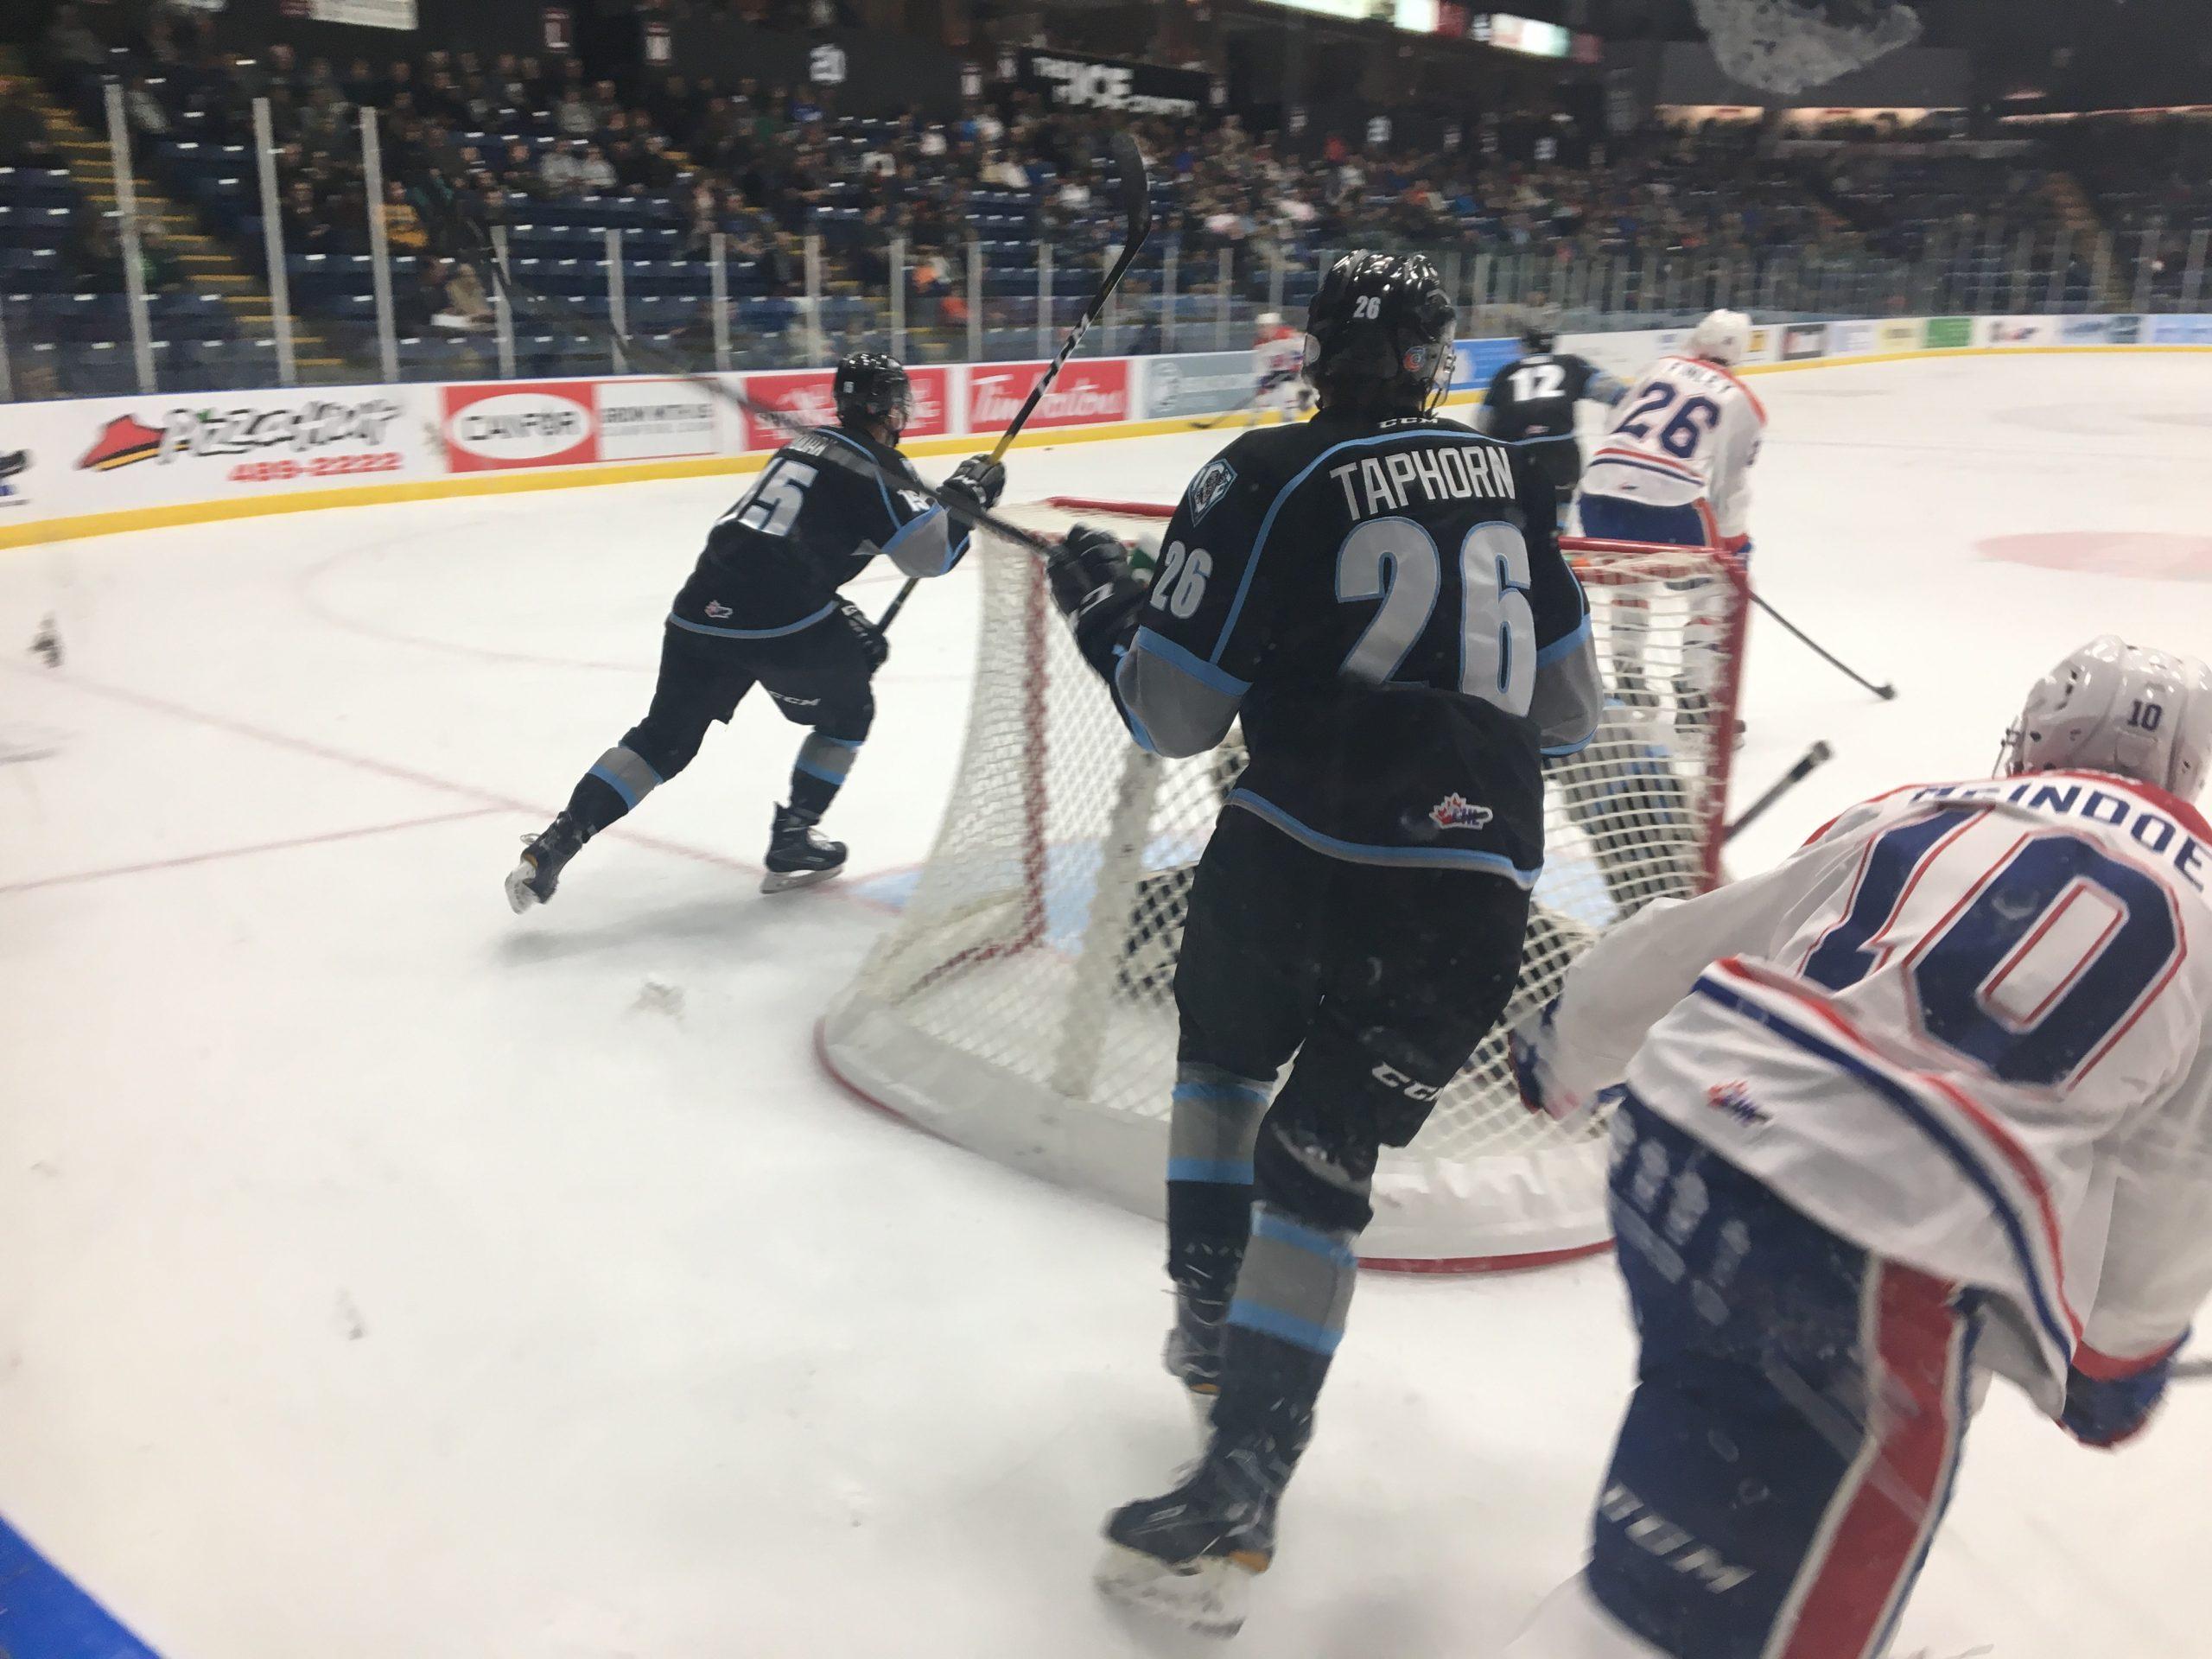 ICE fall 7-4 to Spokane despite 3rd period push